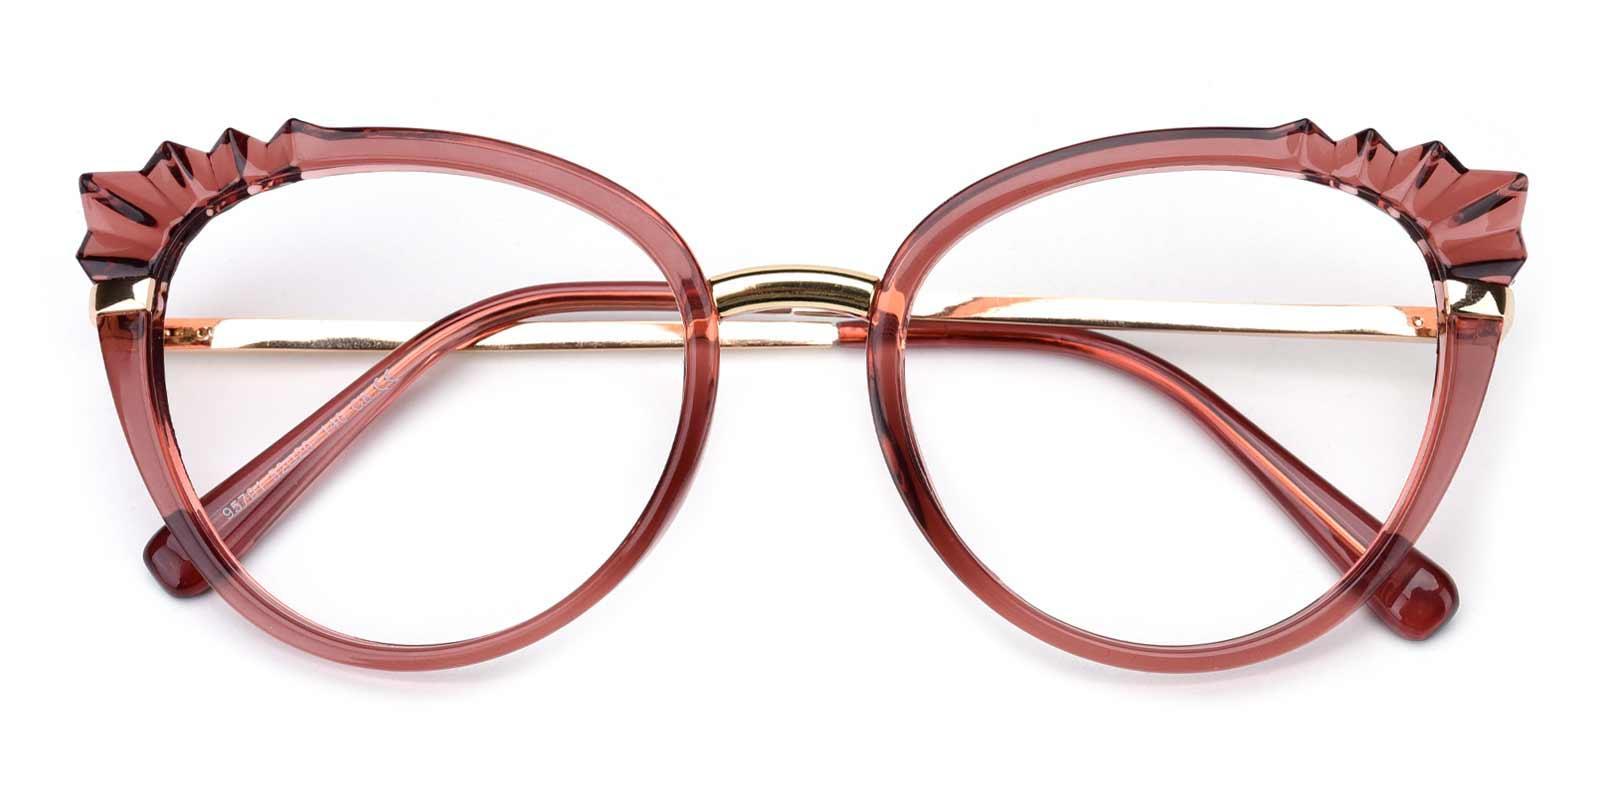 Damara-Red-Cat-Combination-Eyeglasses-detail